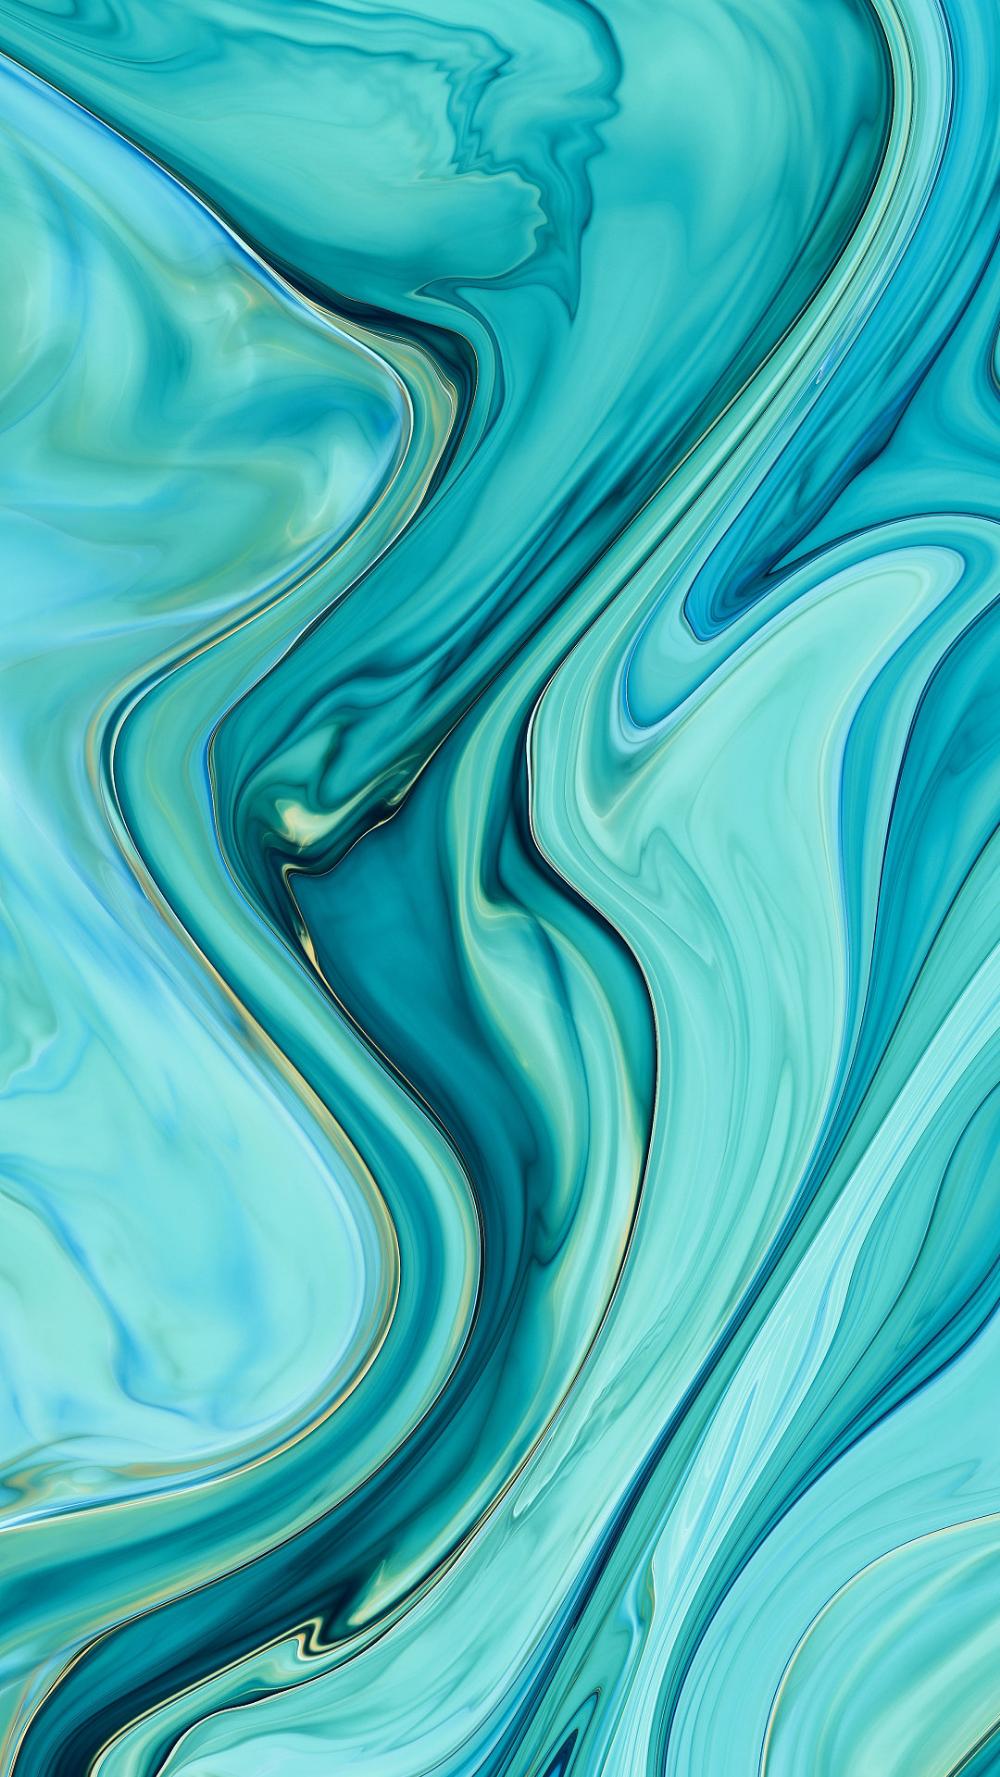 Iphone Blue Green Winding Gradient Visual Wallpaper Background Wallpaper Backgrou Abstract Iphone Wallpaper Backgrounds Phone Wallpapers Iphone Wallpaper Green